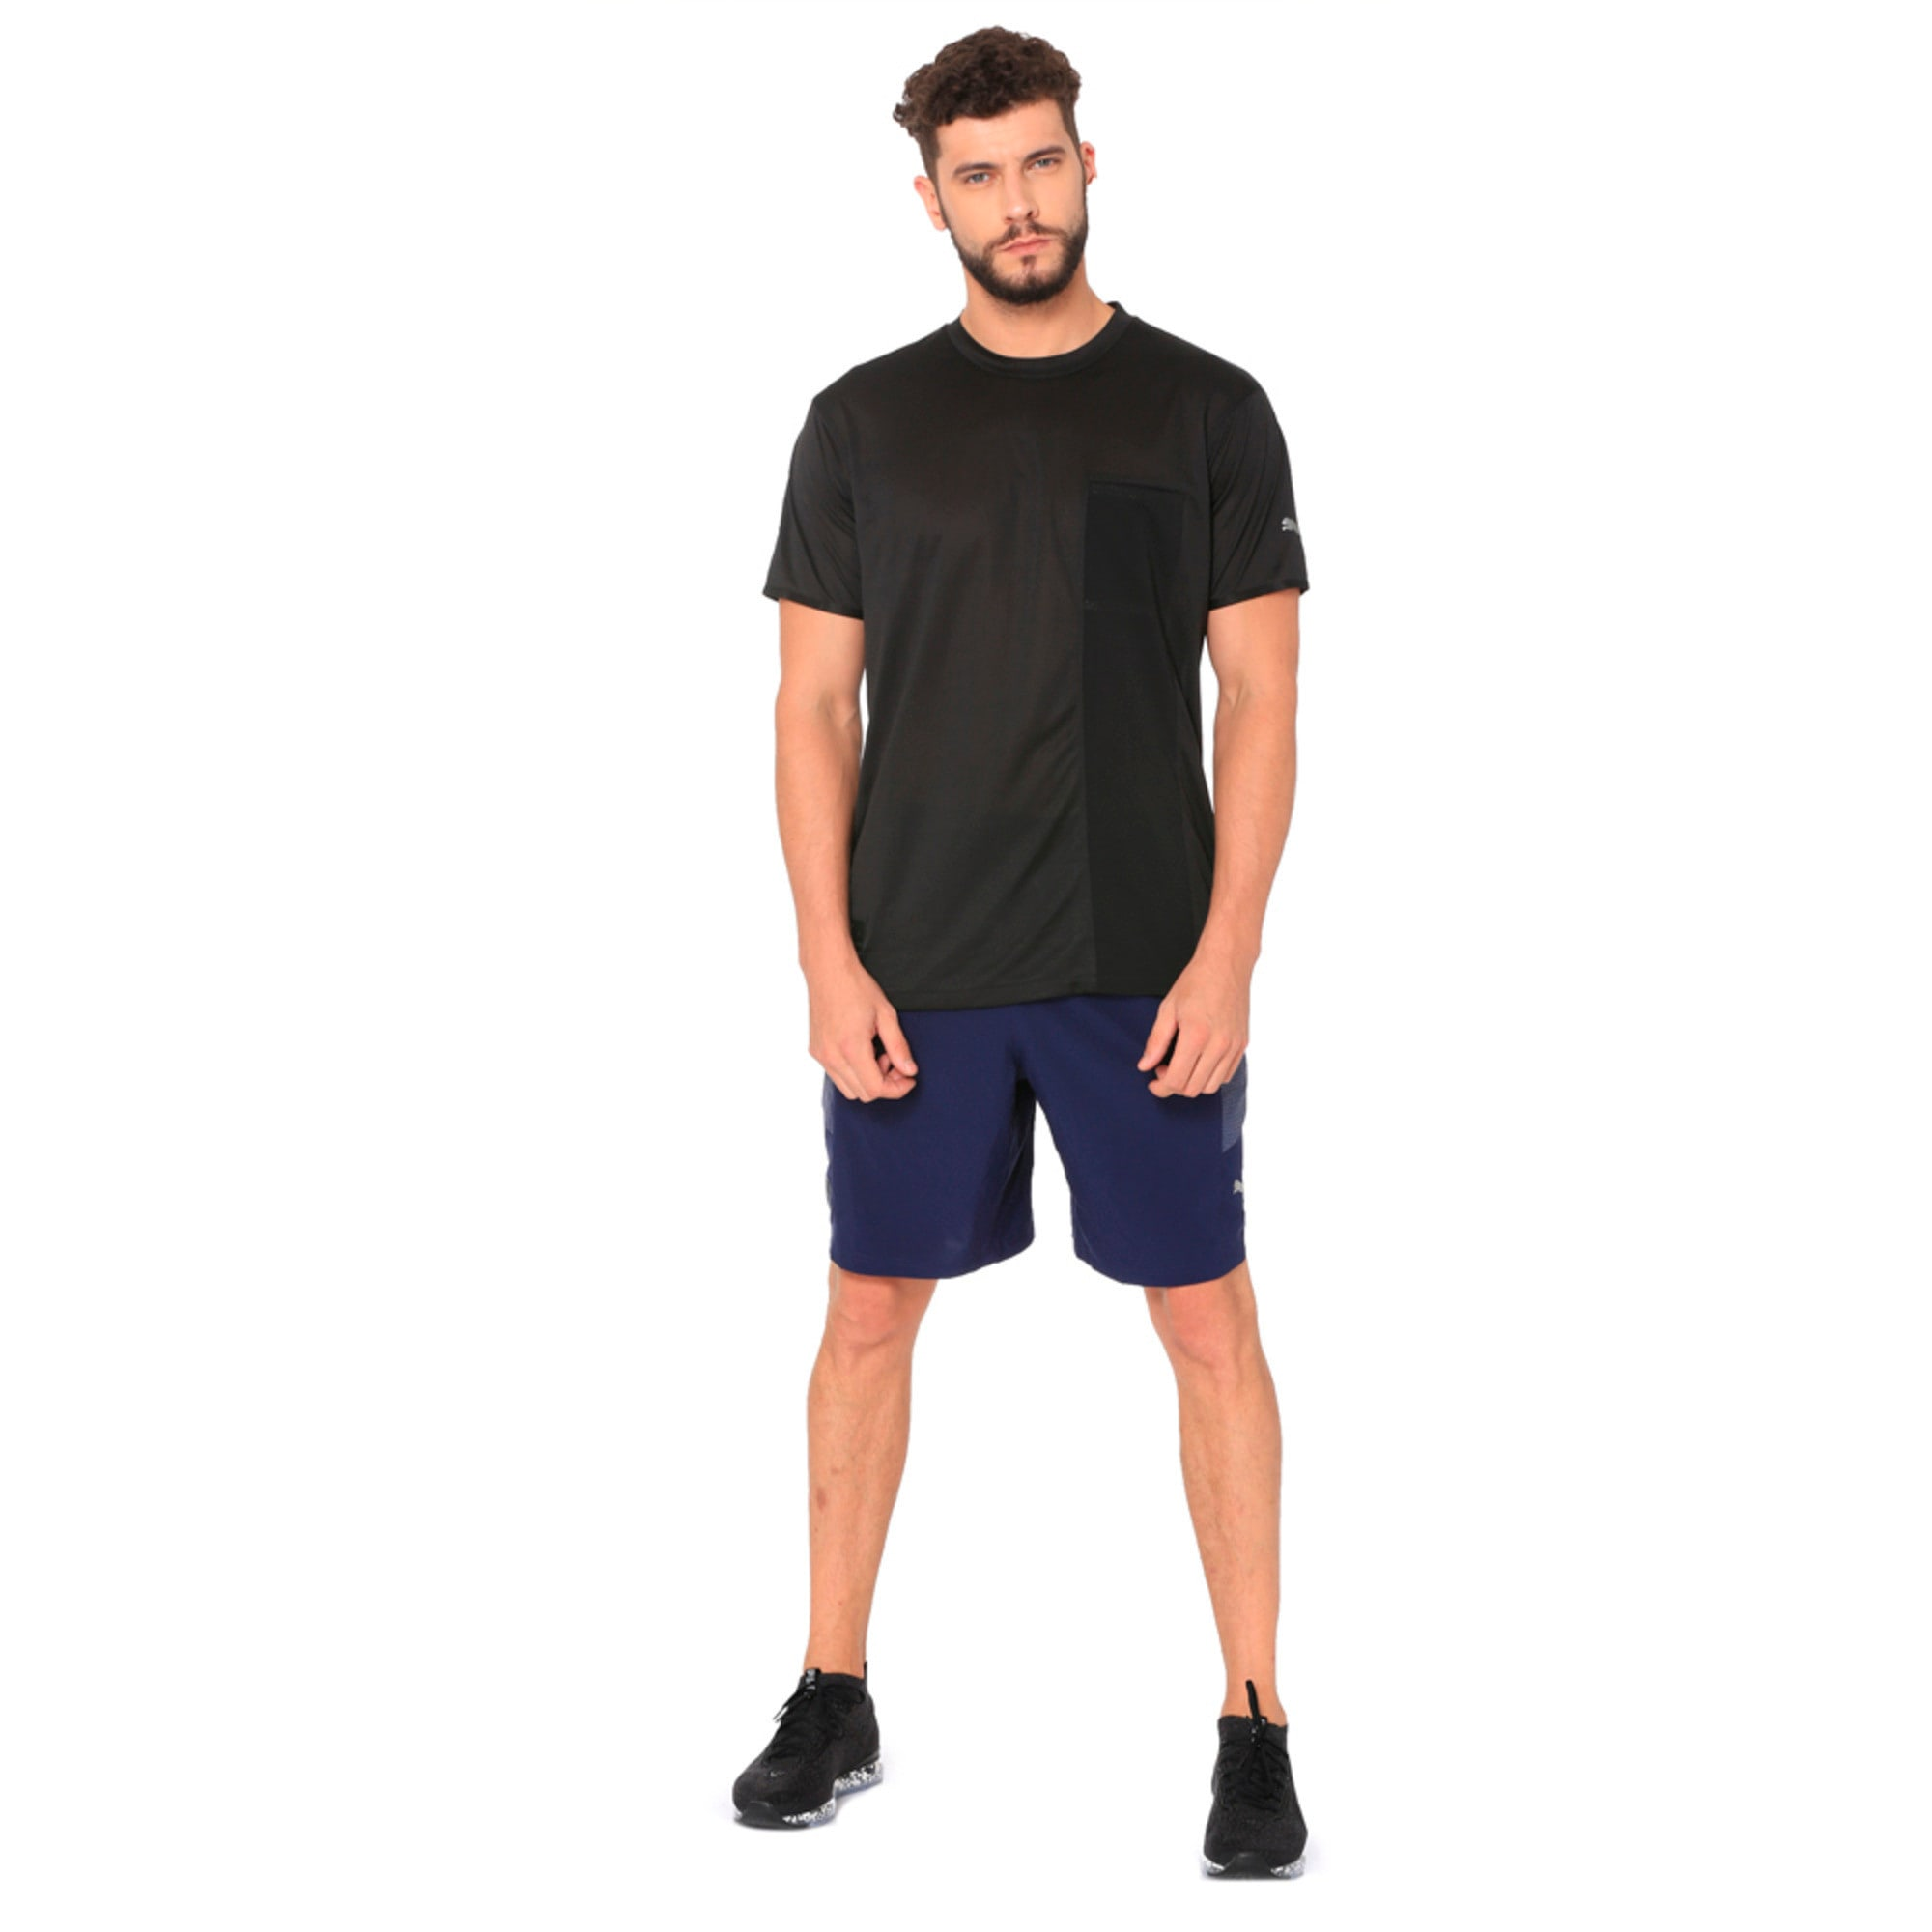 Thumbnail 4 of NeverRunBack 9'' Men's Training Shorts, Peacoat, medium-IND